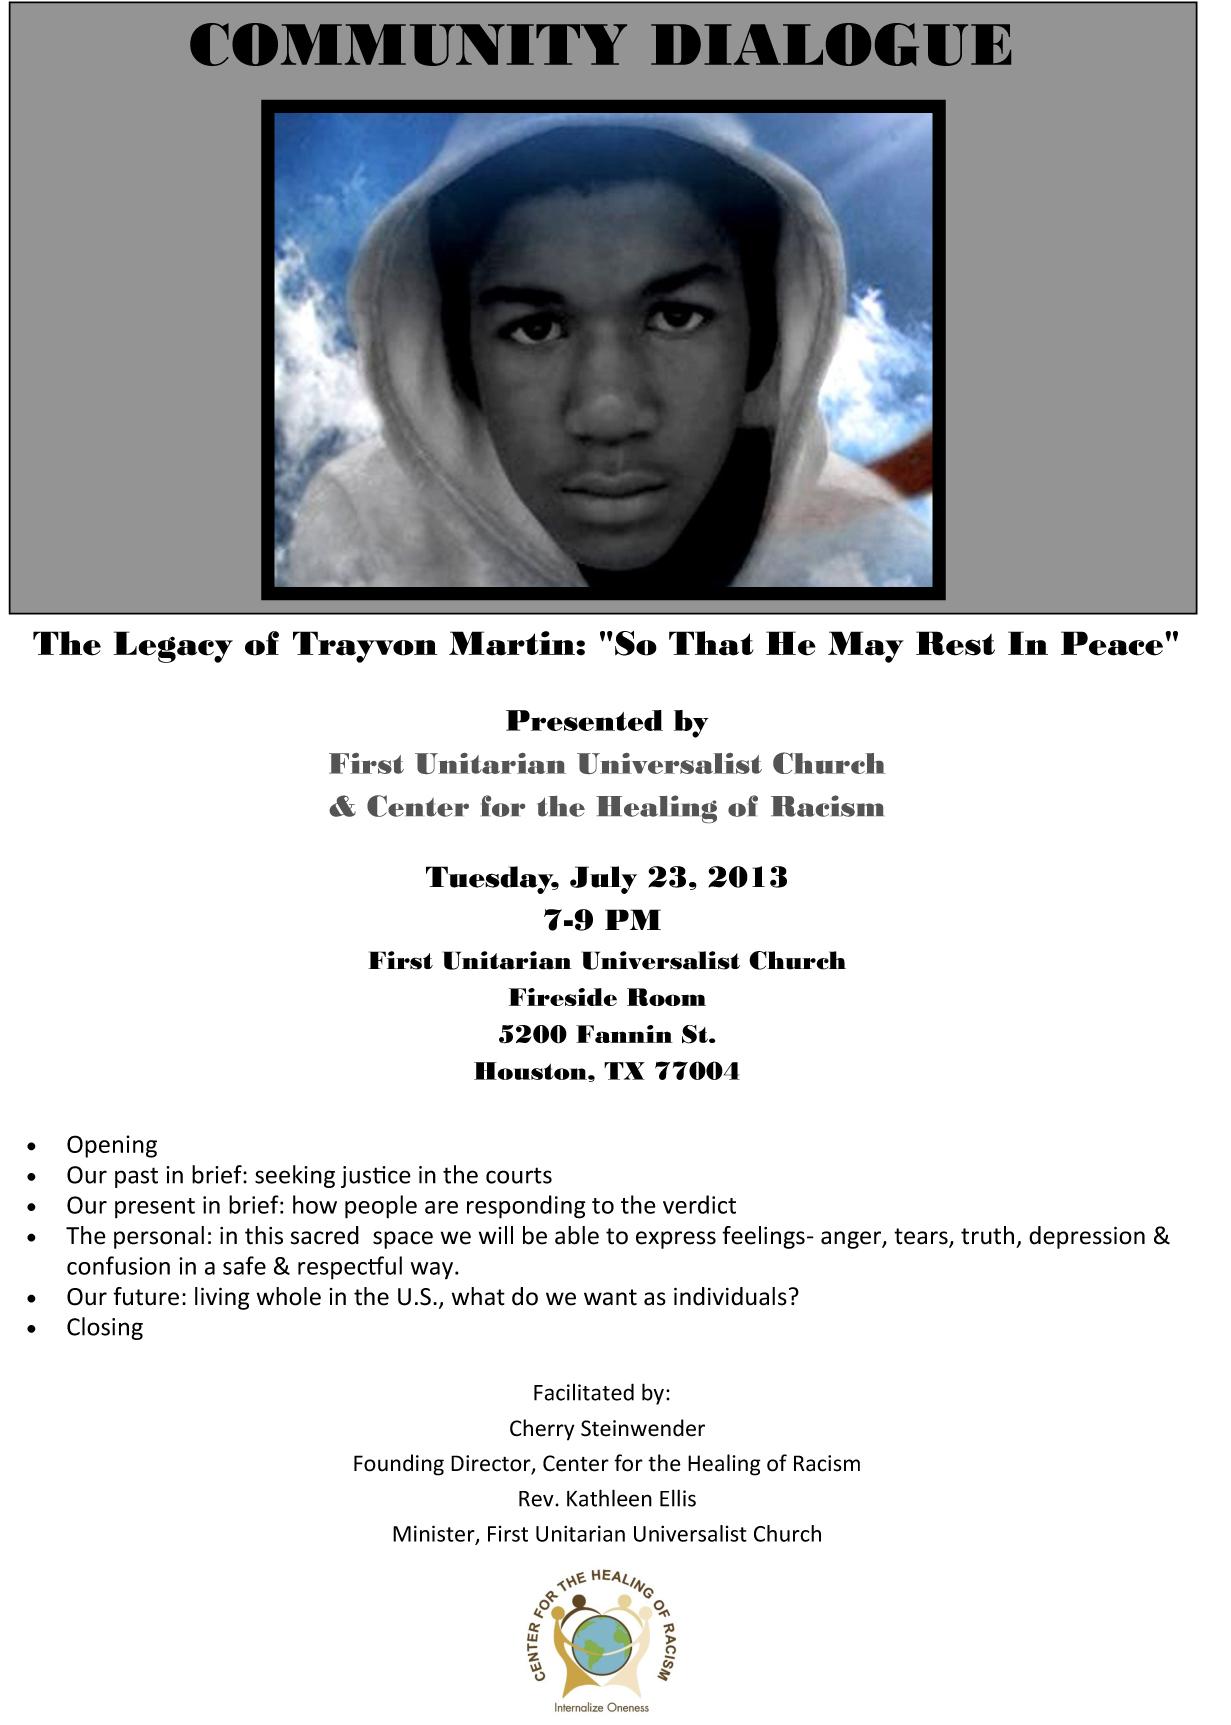 The Legacy of Trayvon Martin: